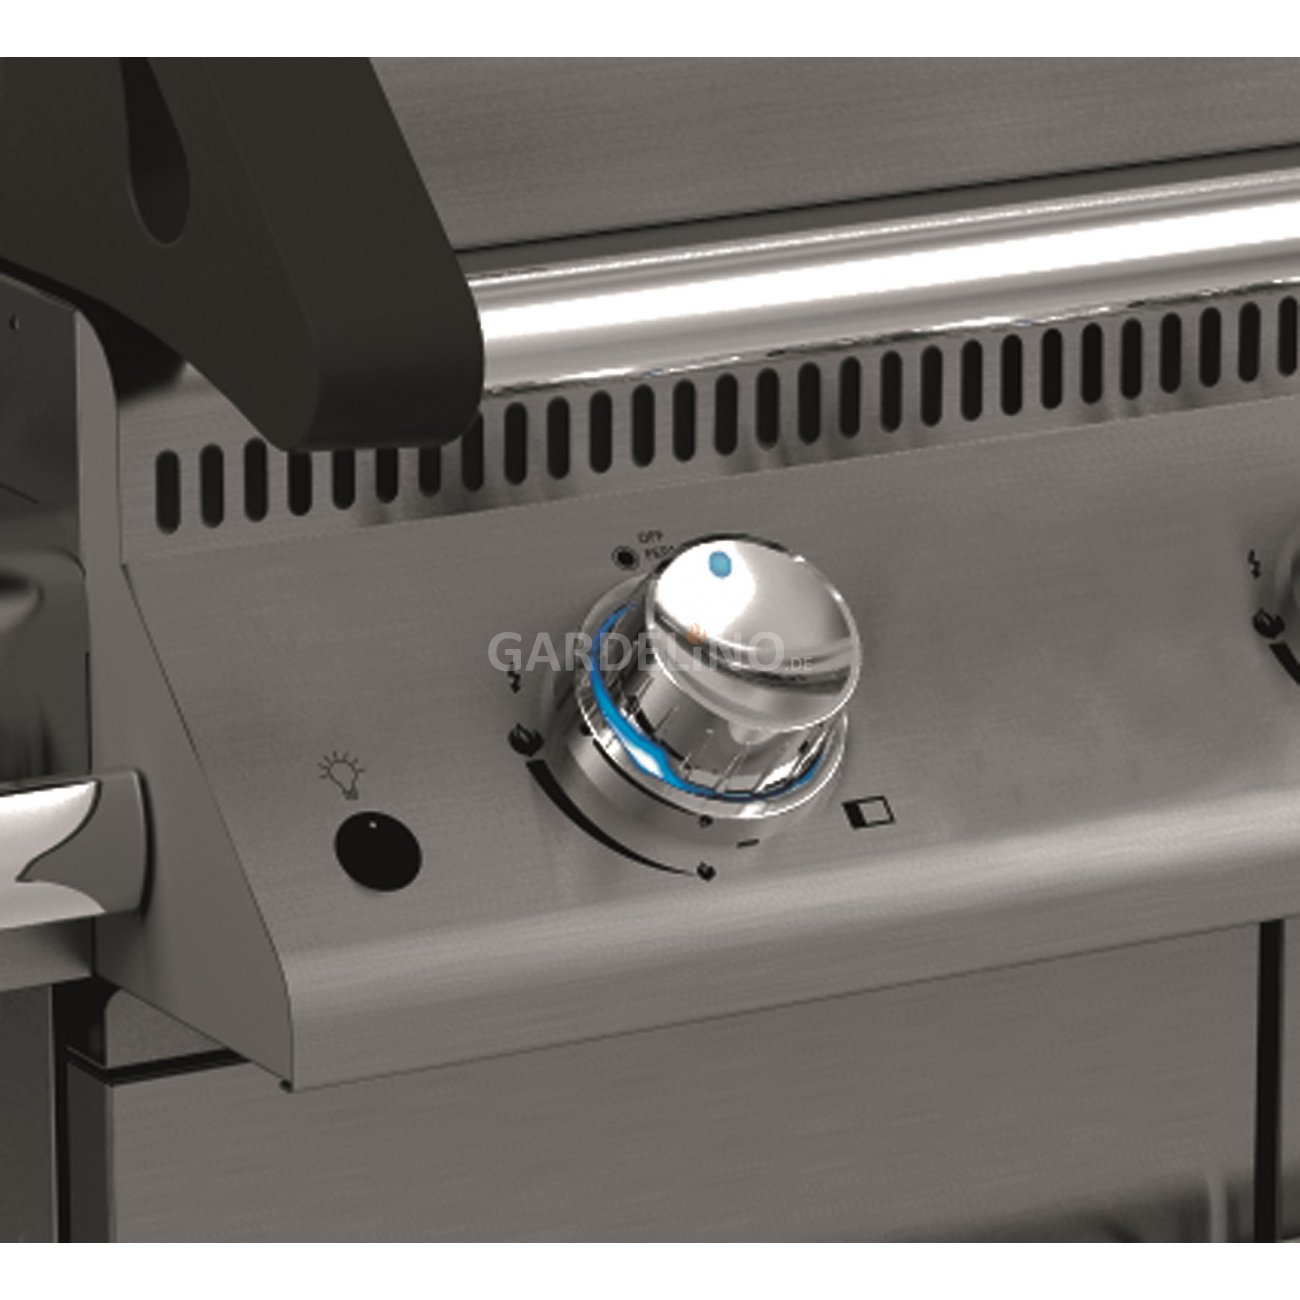 napoleon le3 grill le485rsibpss mit sizzle zone. Black Bedroom Furniture Sets. Home Design Ideas